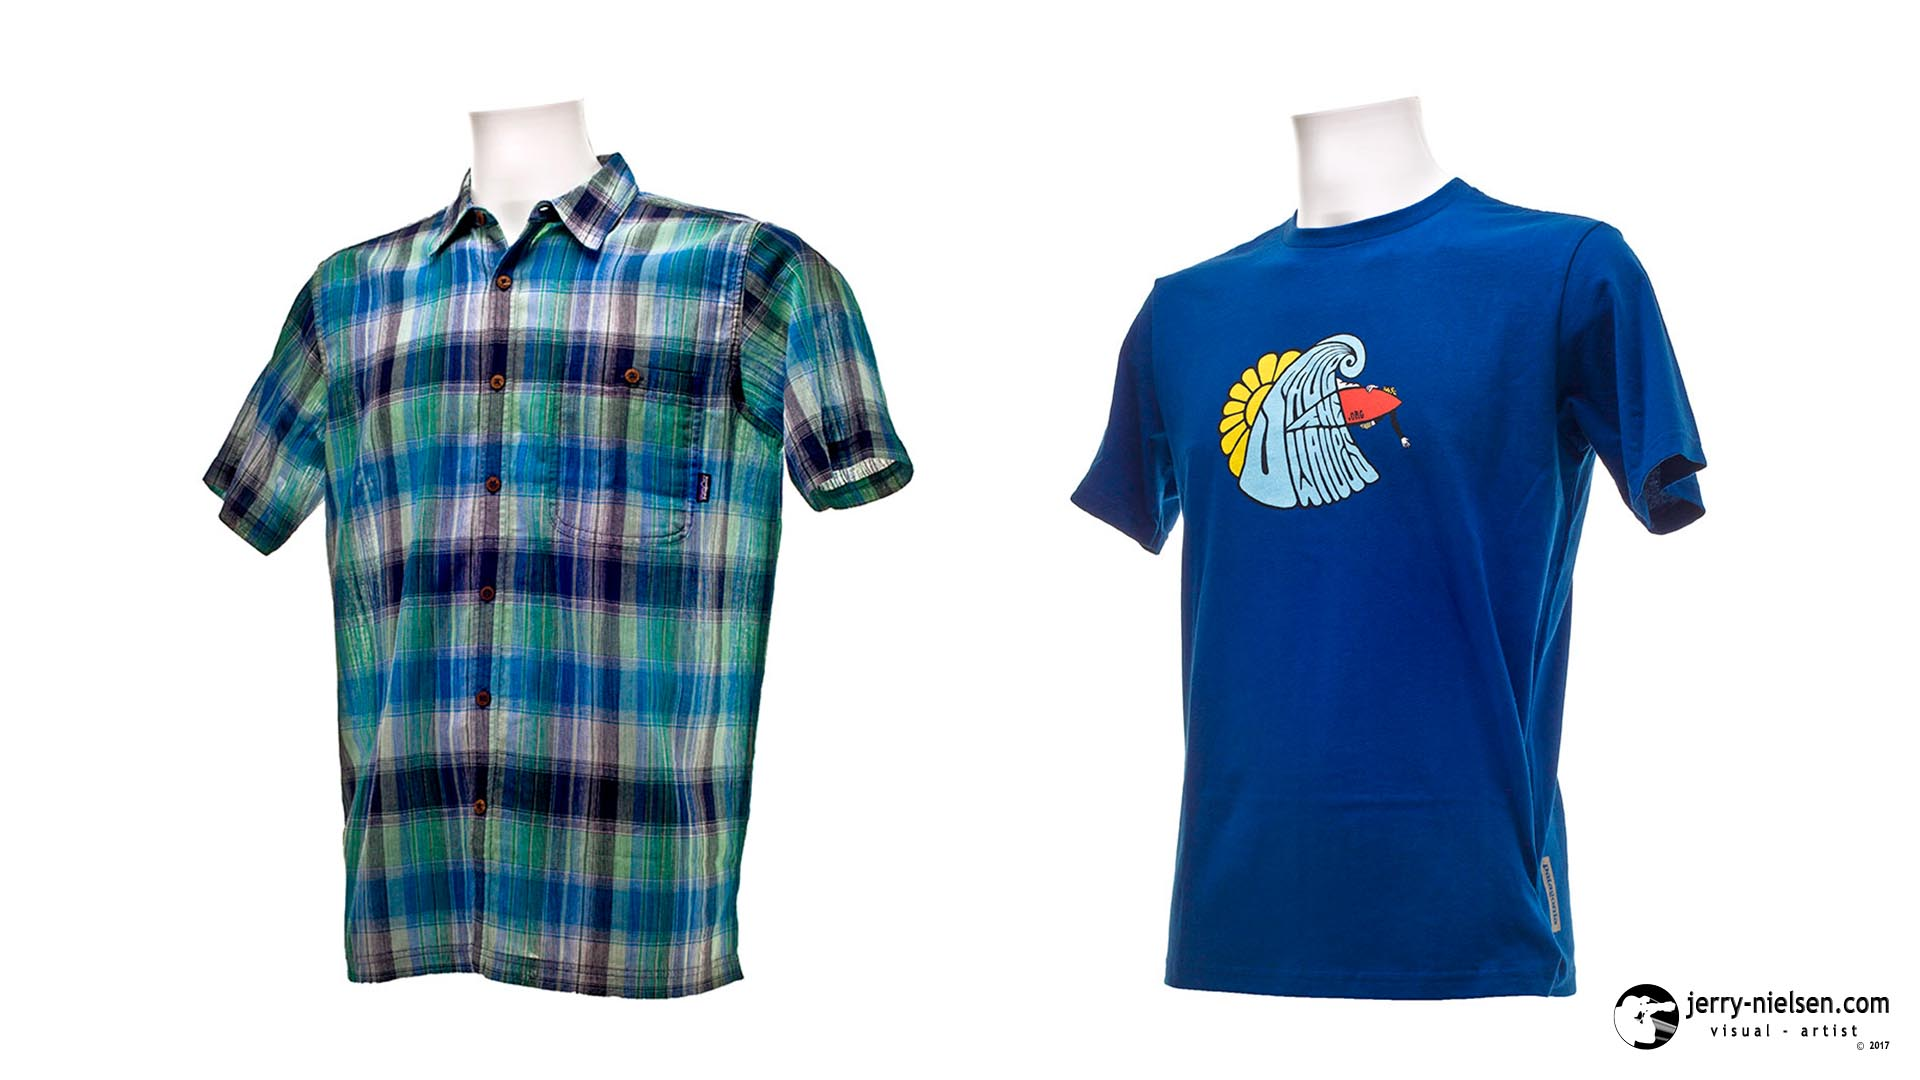 Male Patagonia Shirt and T-shirt